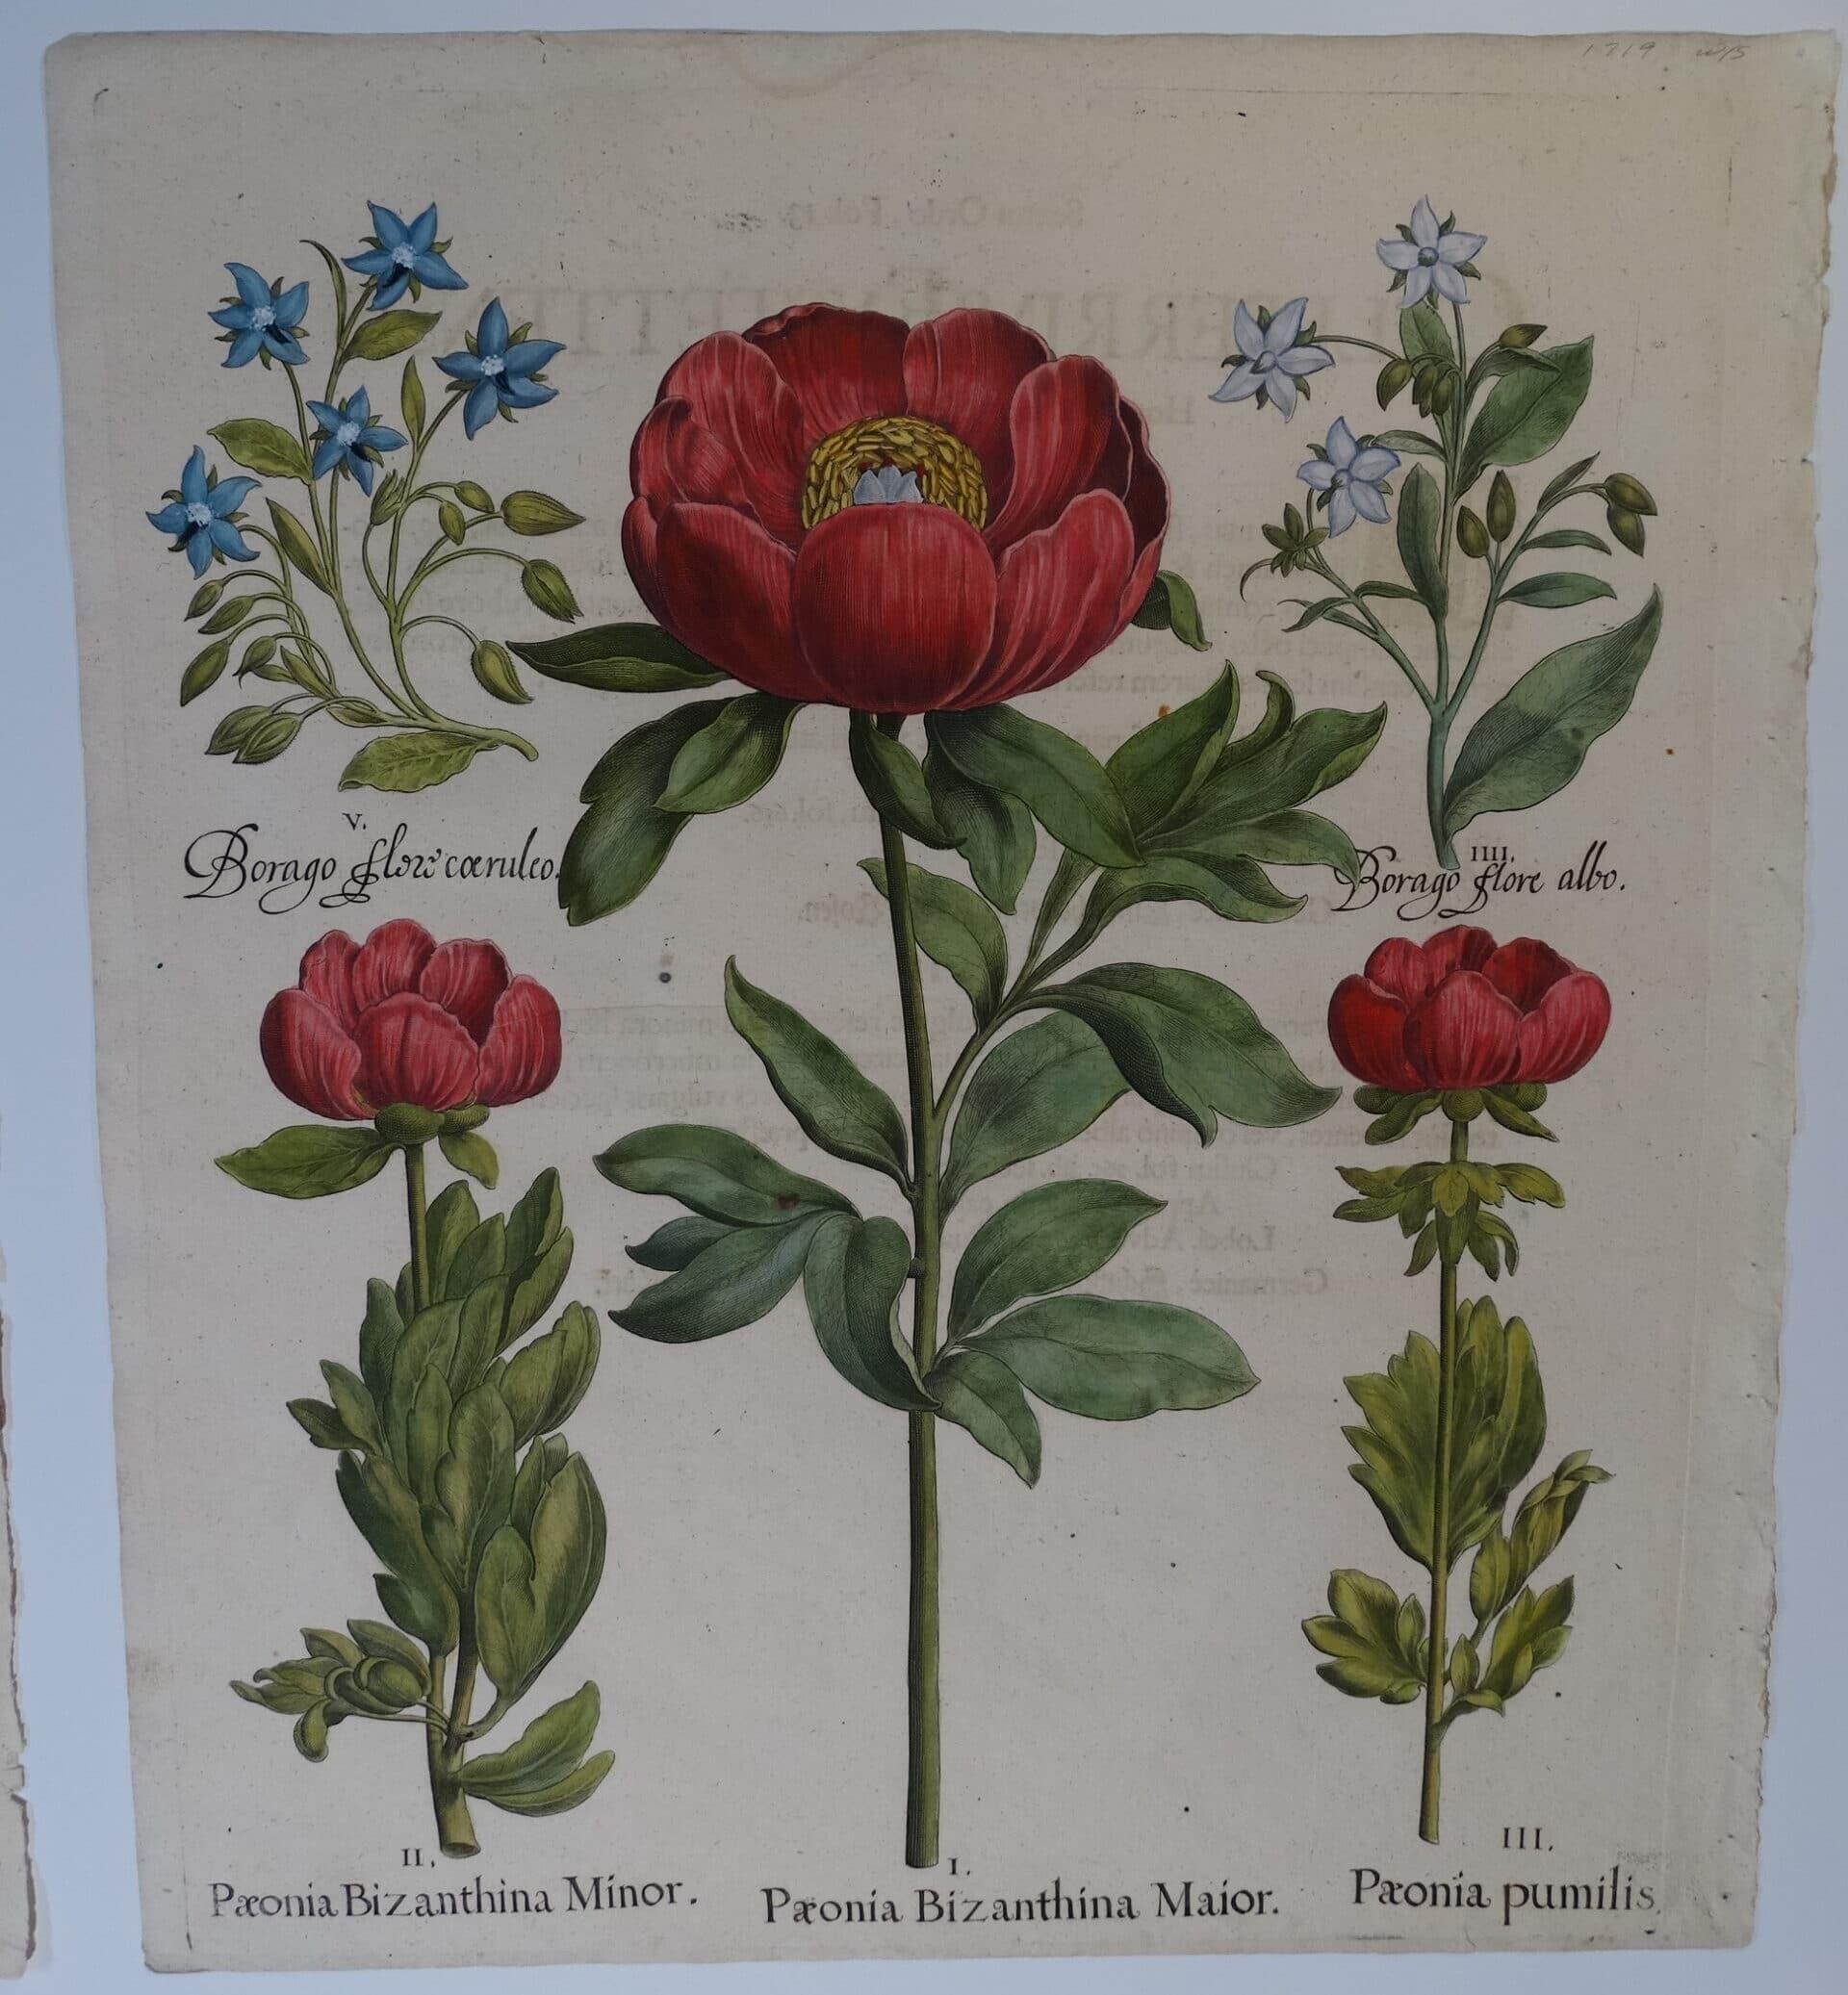 Basil Besler's Hortus Eystettensis Florilegium Paeonia Bizanthina Minor Major pumilis 1713 edition